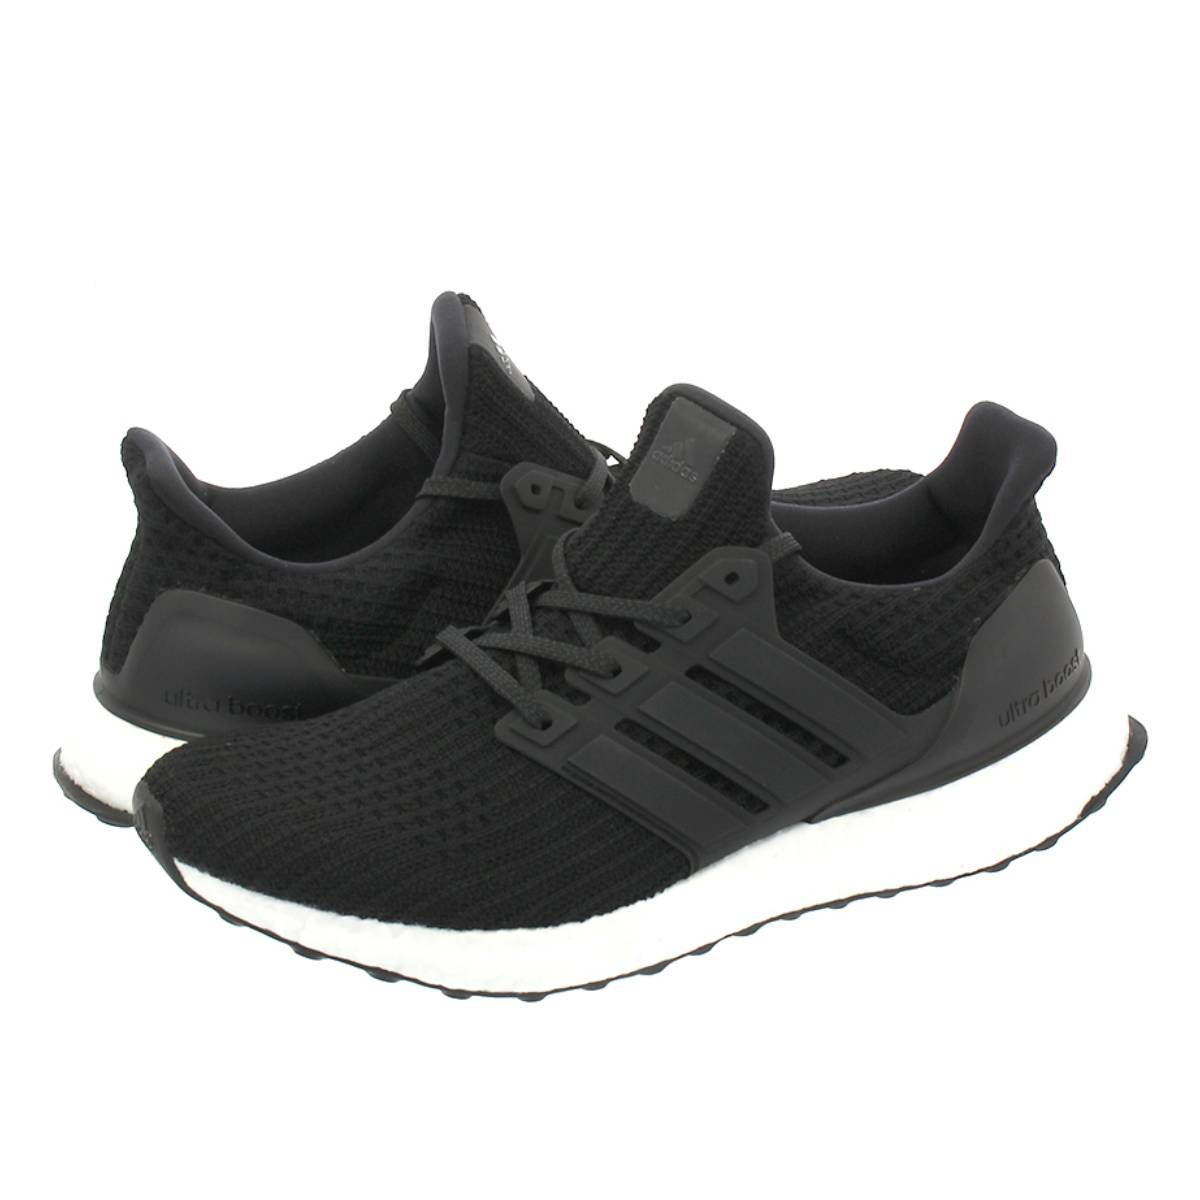 adidas ULTRA BOOST Adidas ultra boost CORE BLACK CORE BLACK CORE BLACK db1f665b1